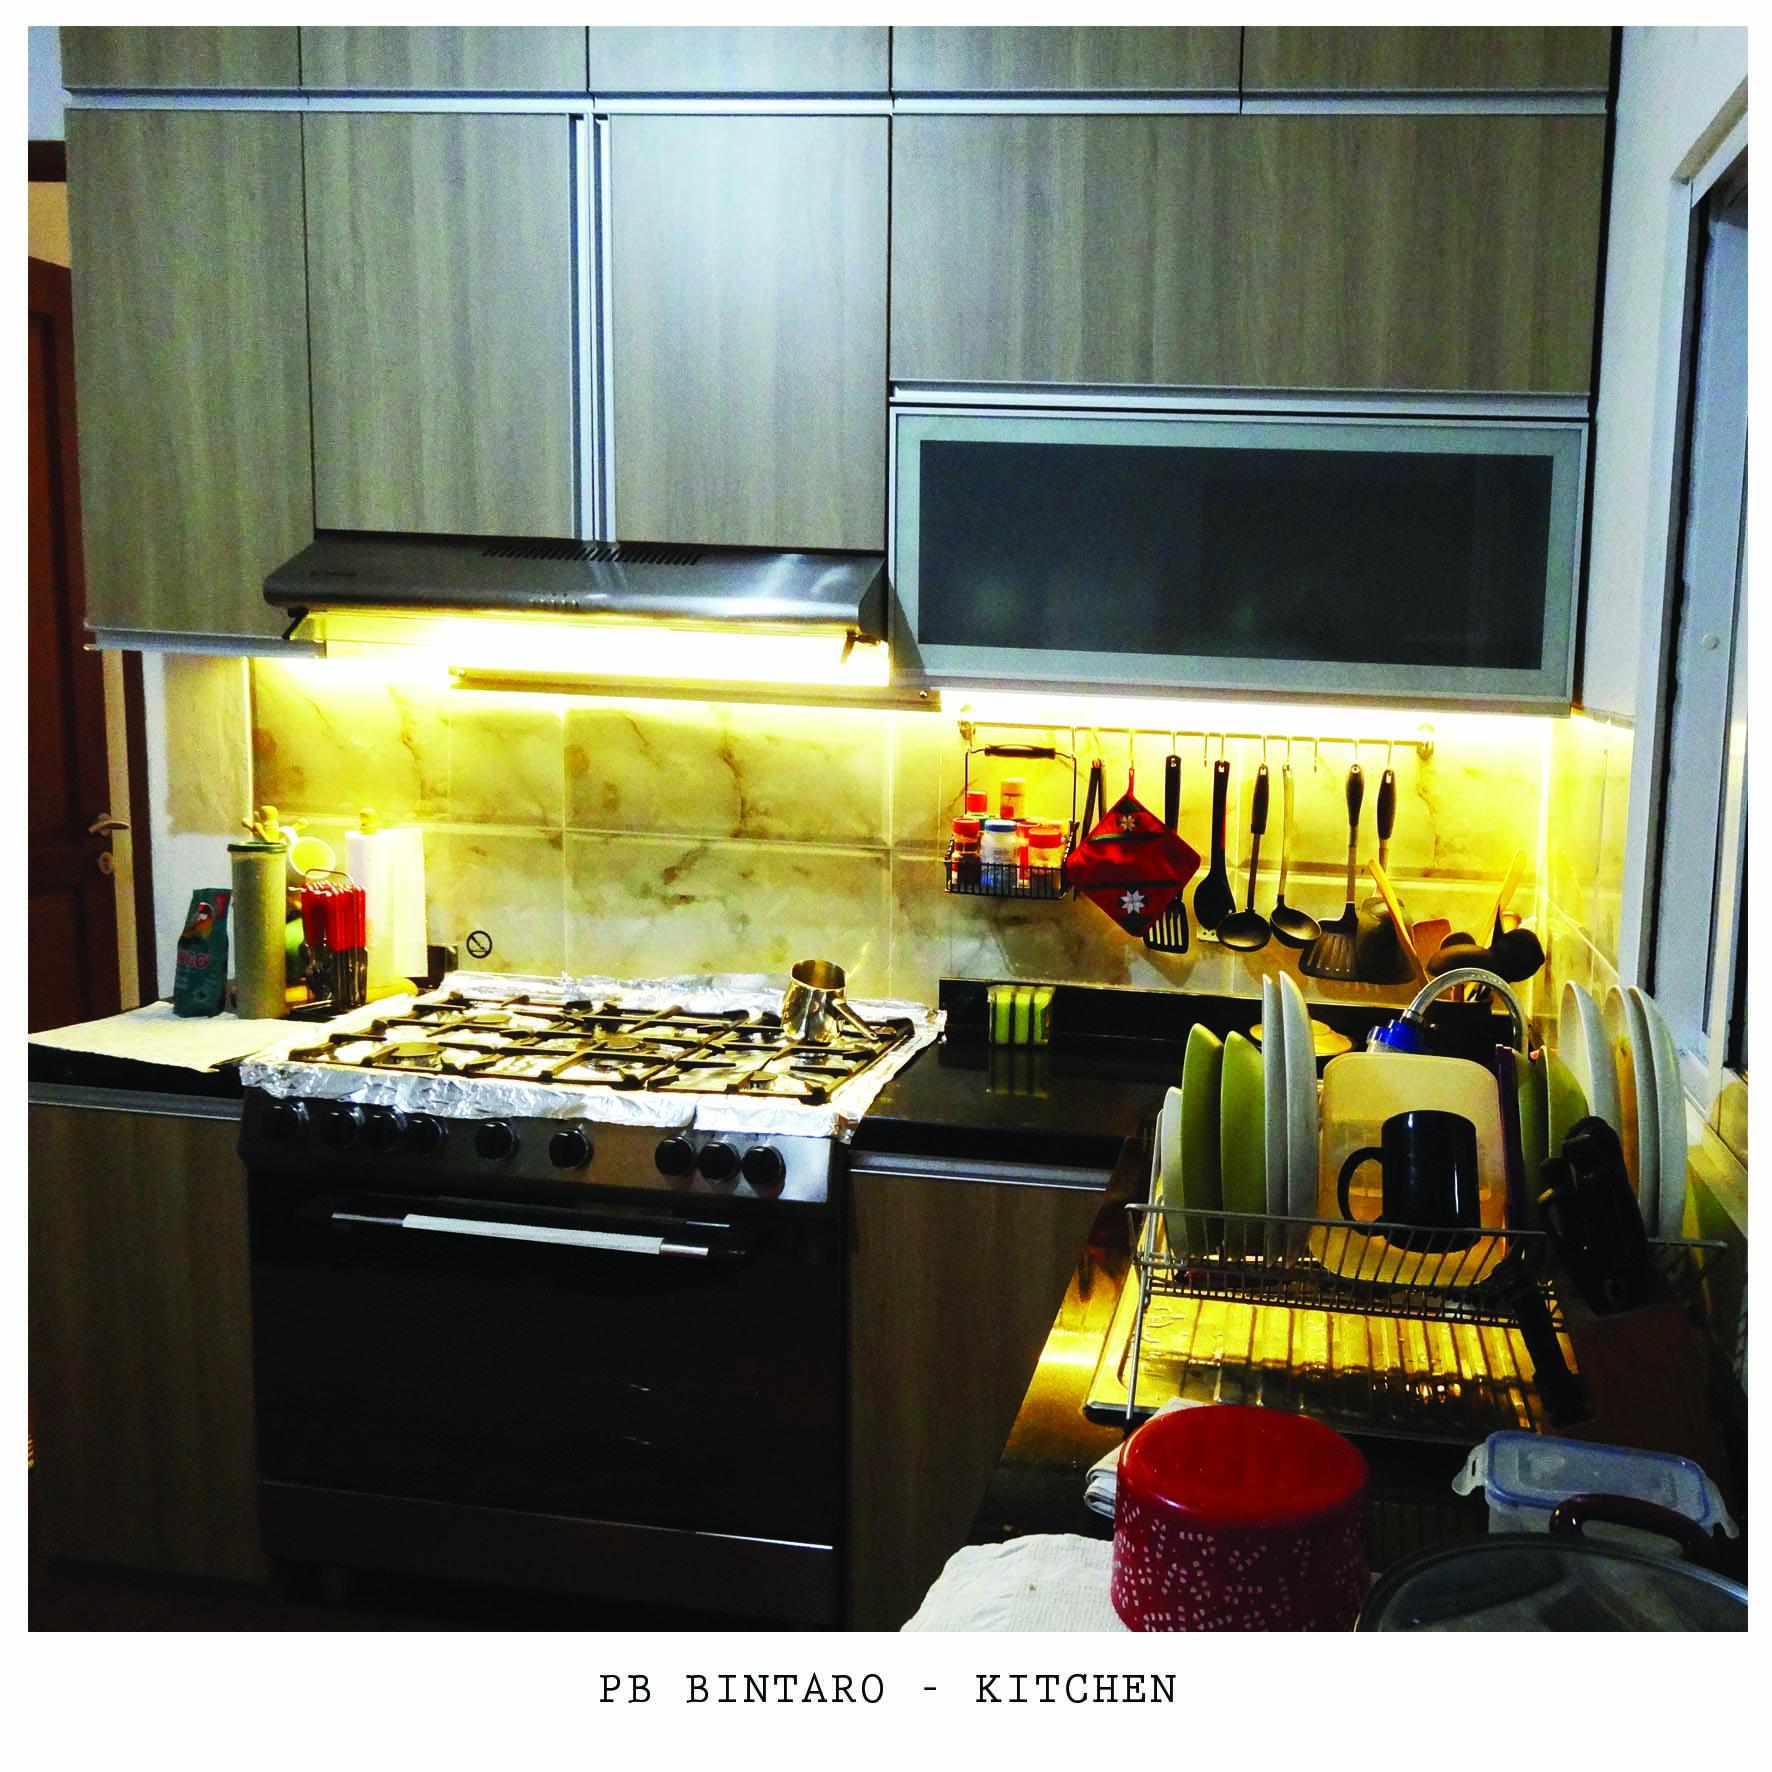 X3M Architects Pb 6 House Bintaro Bintaro X3M-Architects-Pb-6-House   75952